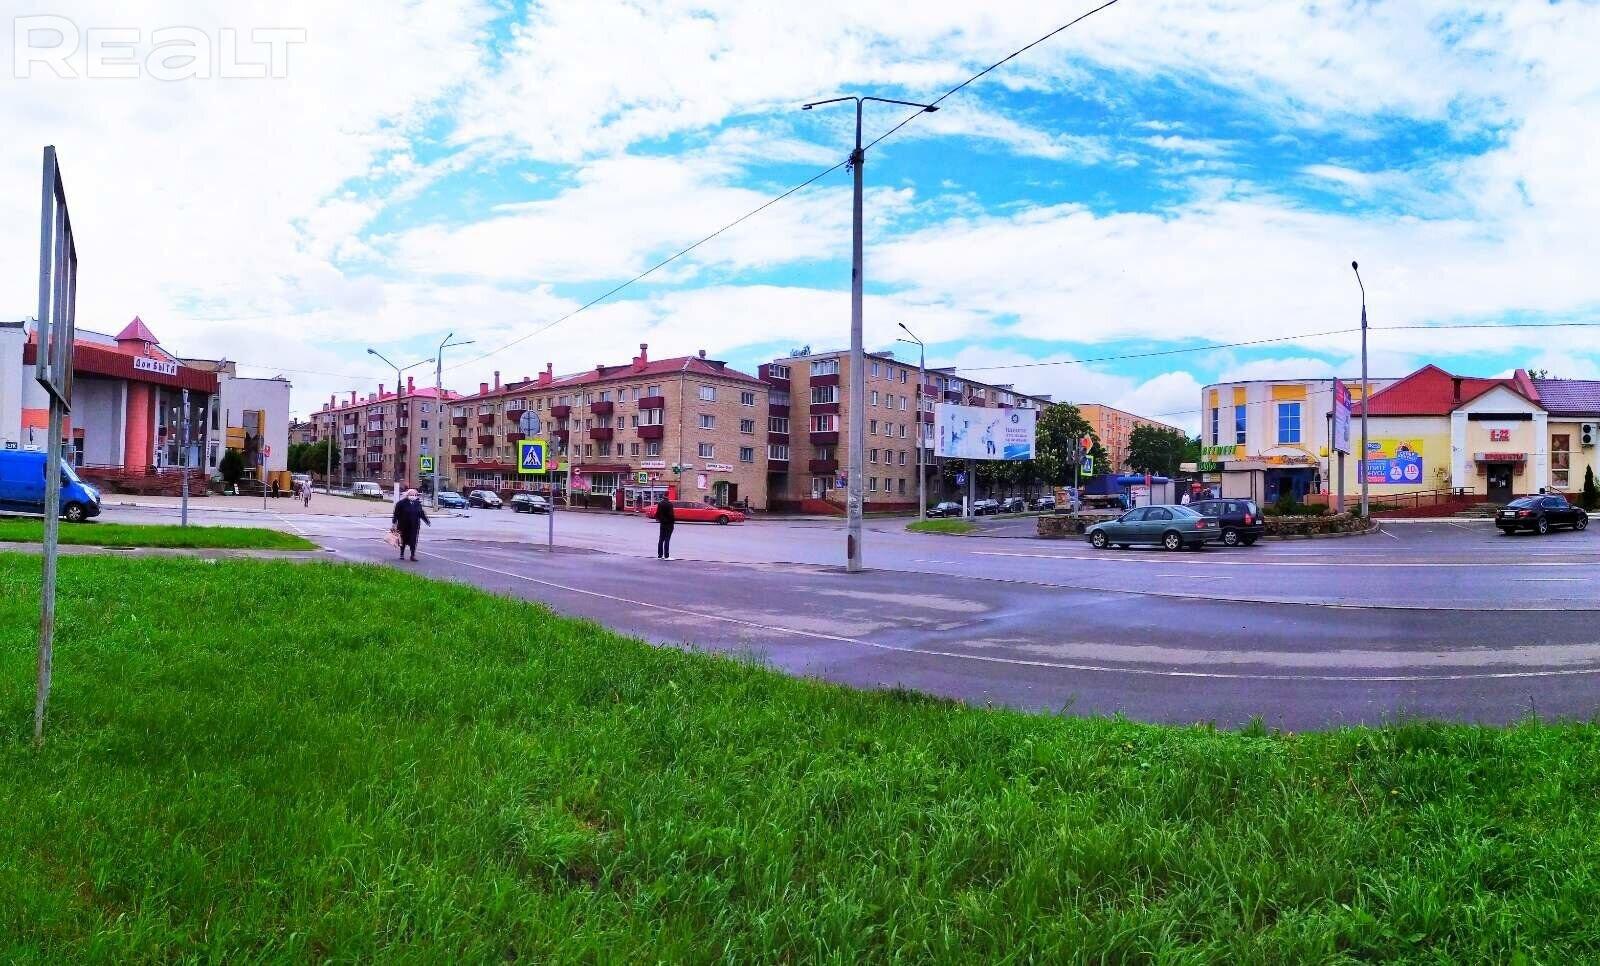 Продажа 2-х комнатной квартиры, г. Рогачев, ул. Ленина, дом 78. Цена 41 929 руб